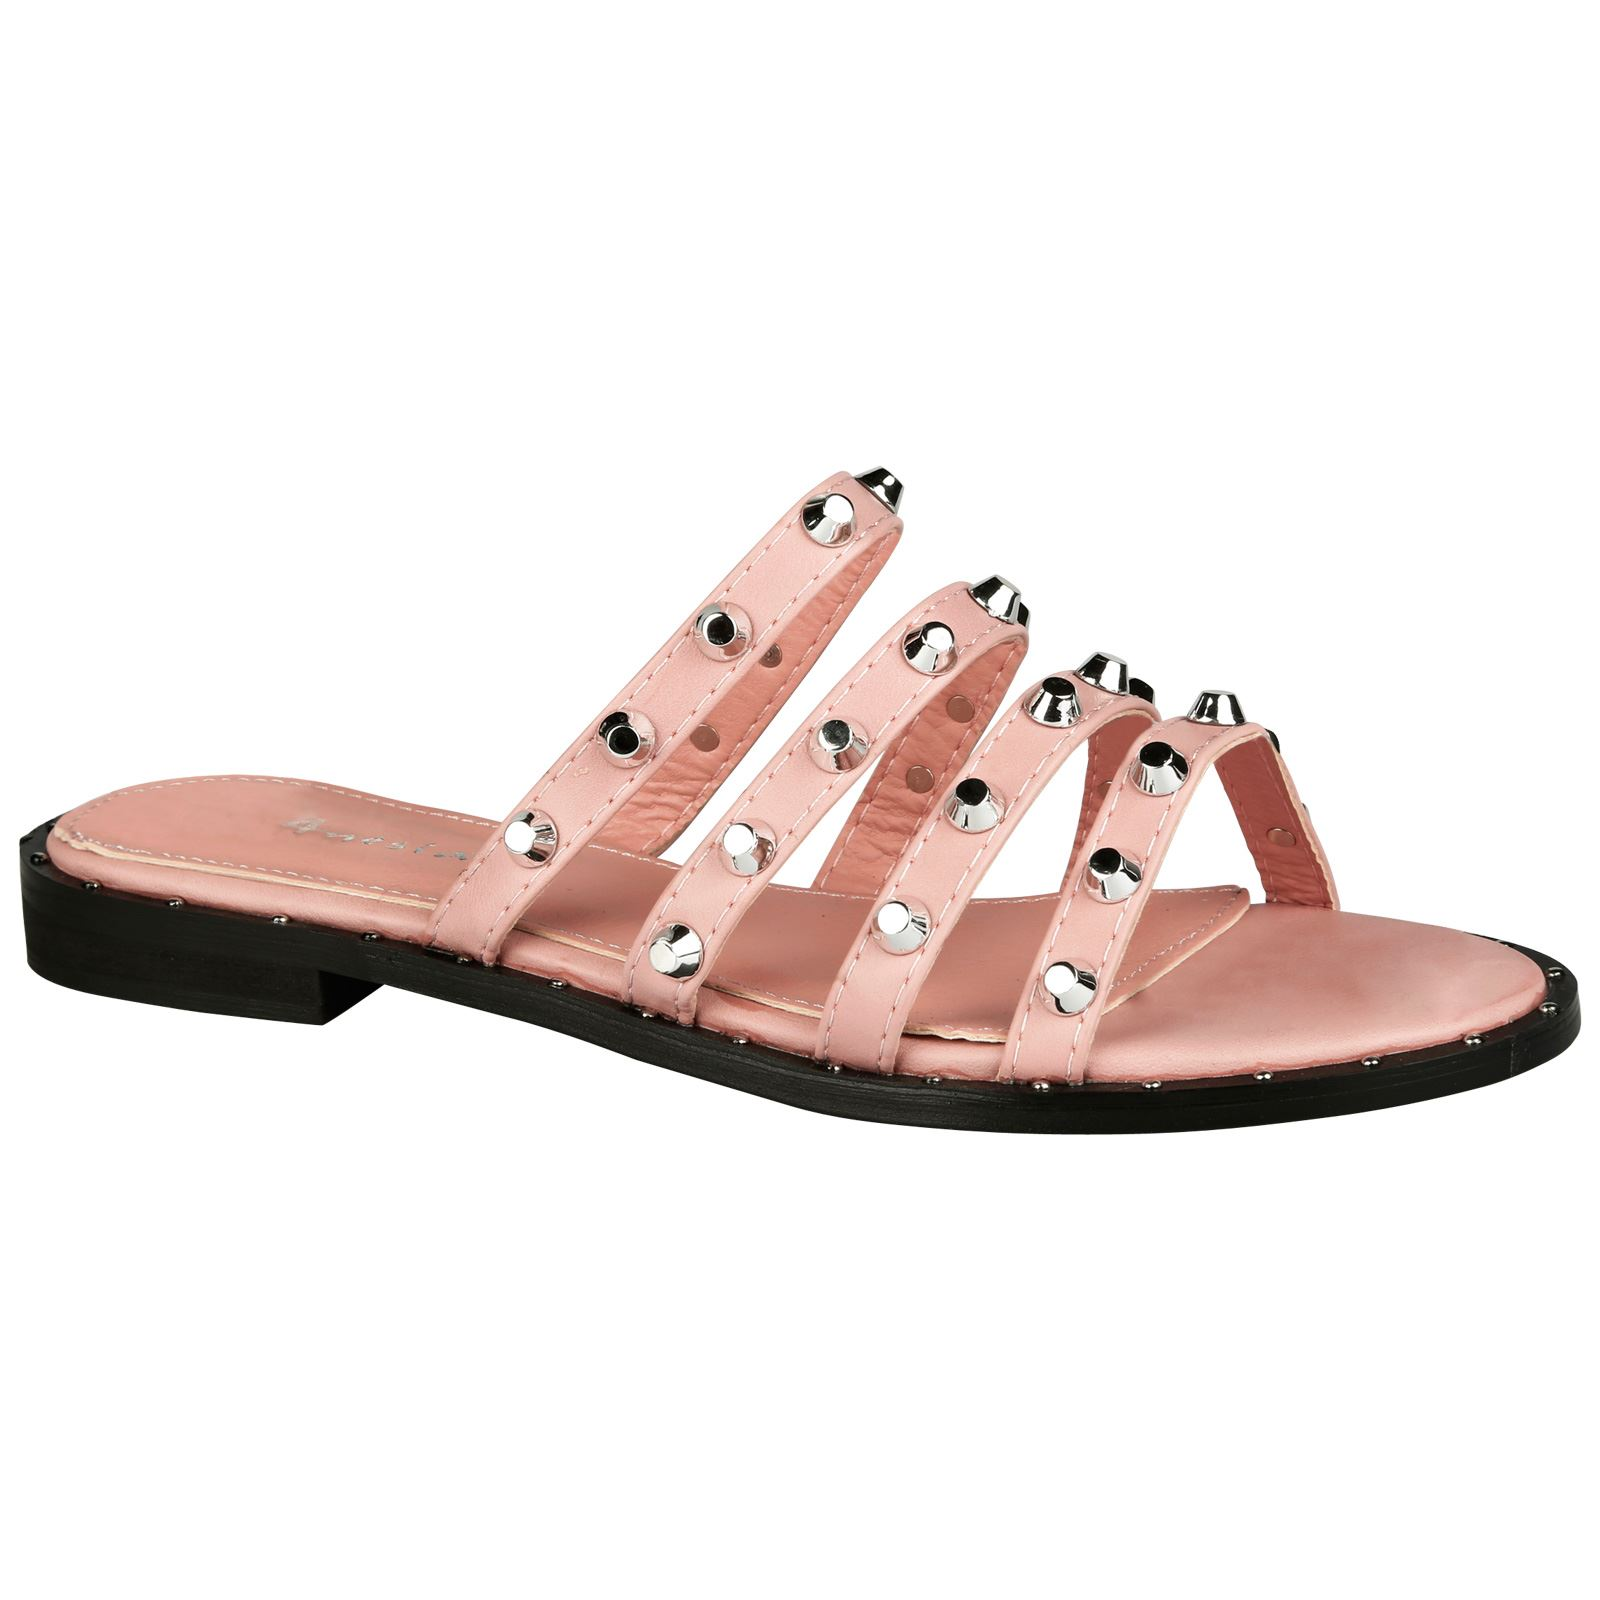 41badb71a537 Vita Womens Flats Low HEELS Slip on Studded Sandals Ladies Sliders ...